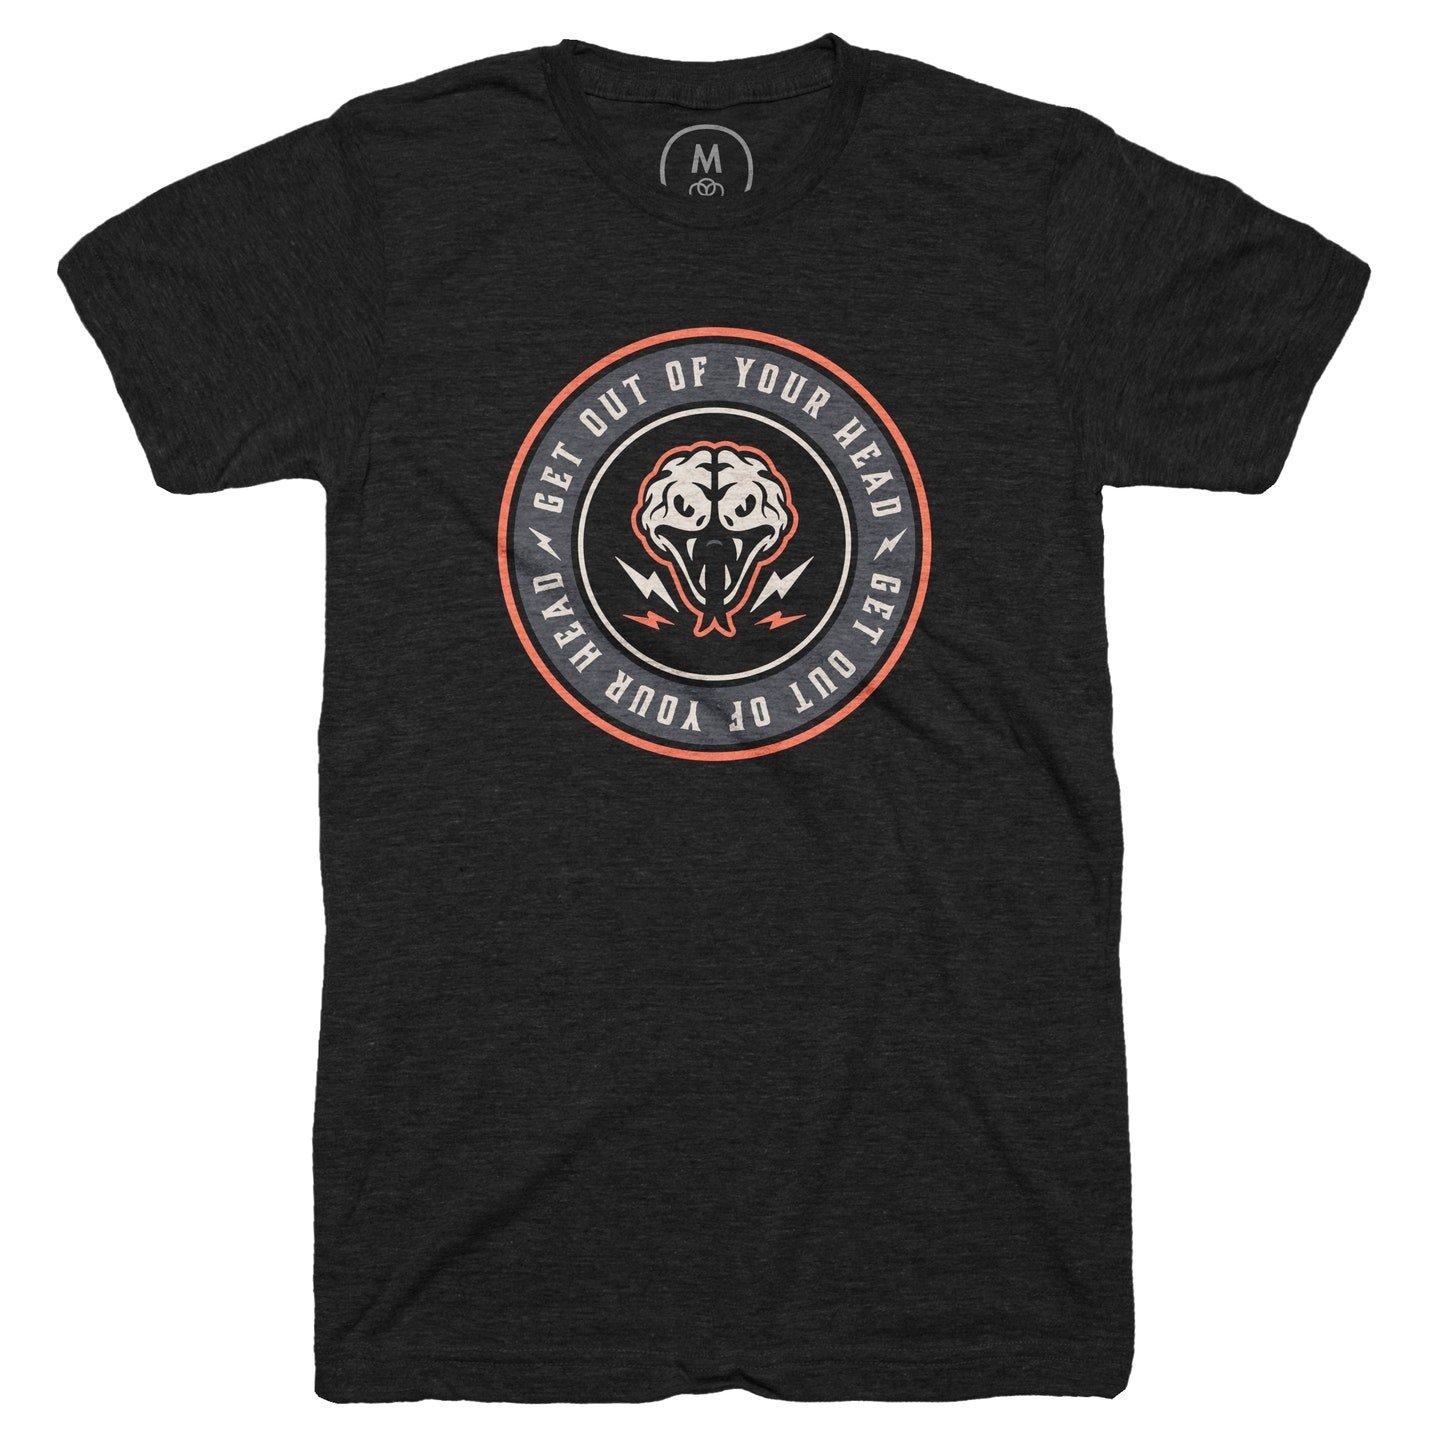 gooyh patch t-shirt